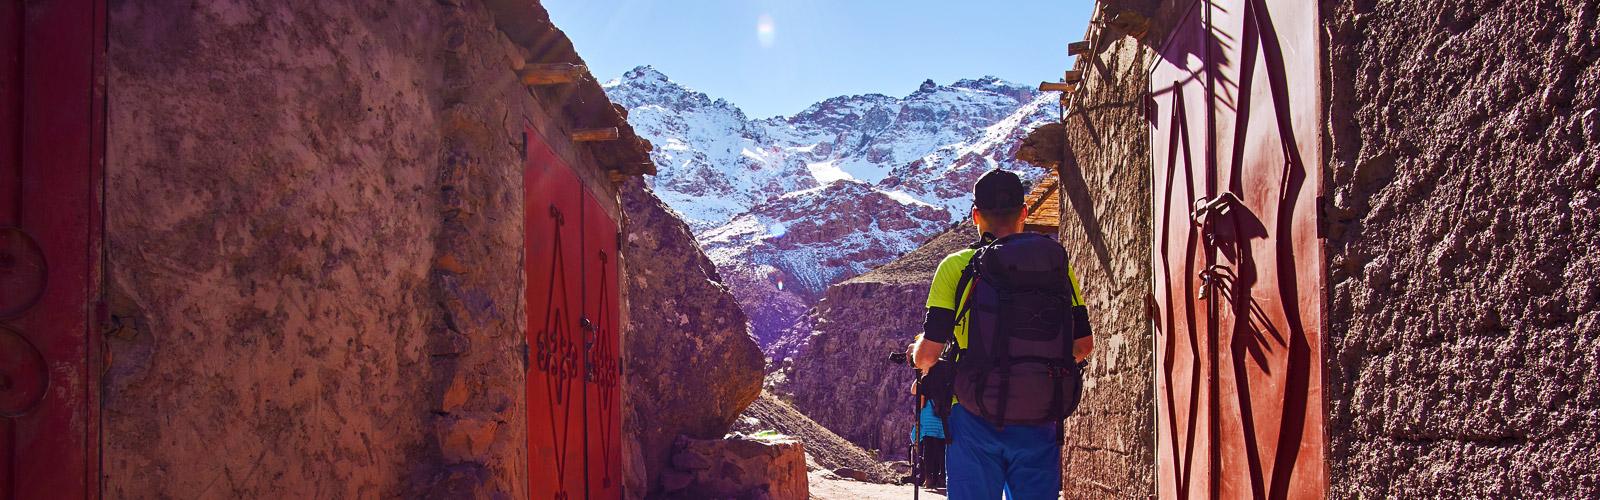 Trekking Semana Santa 2020